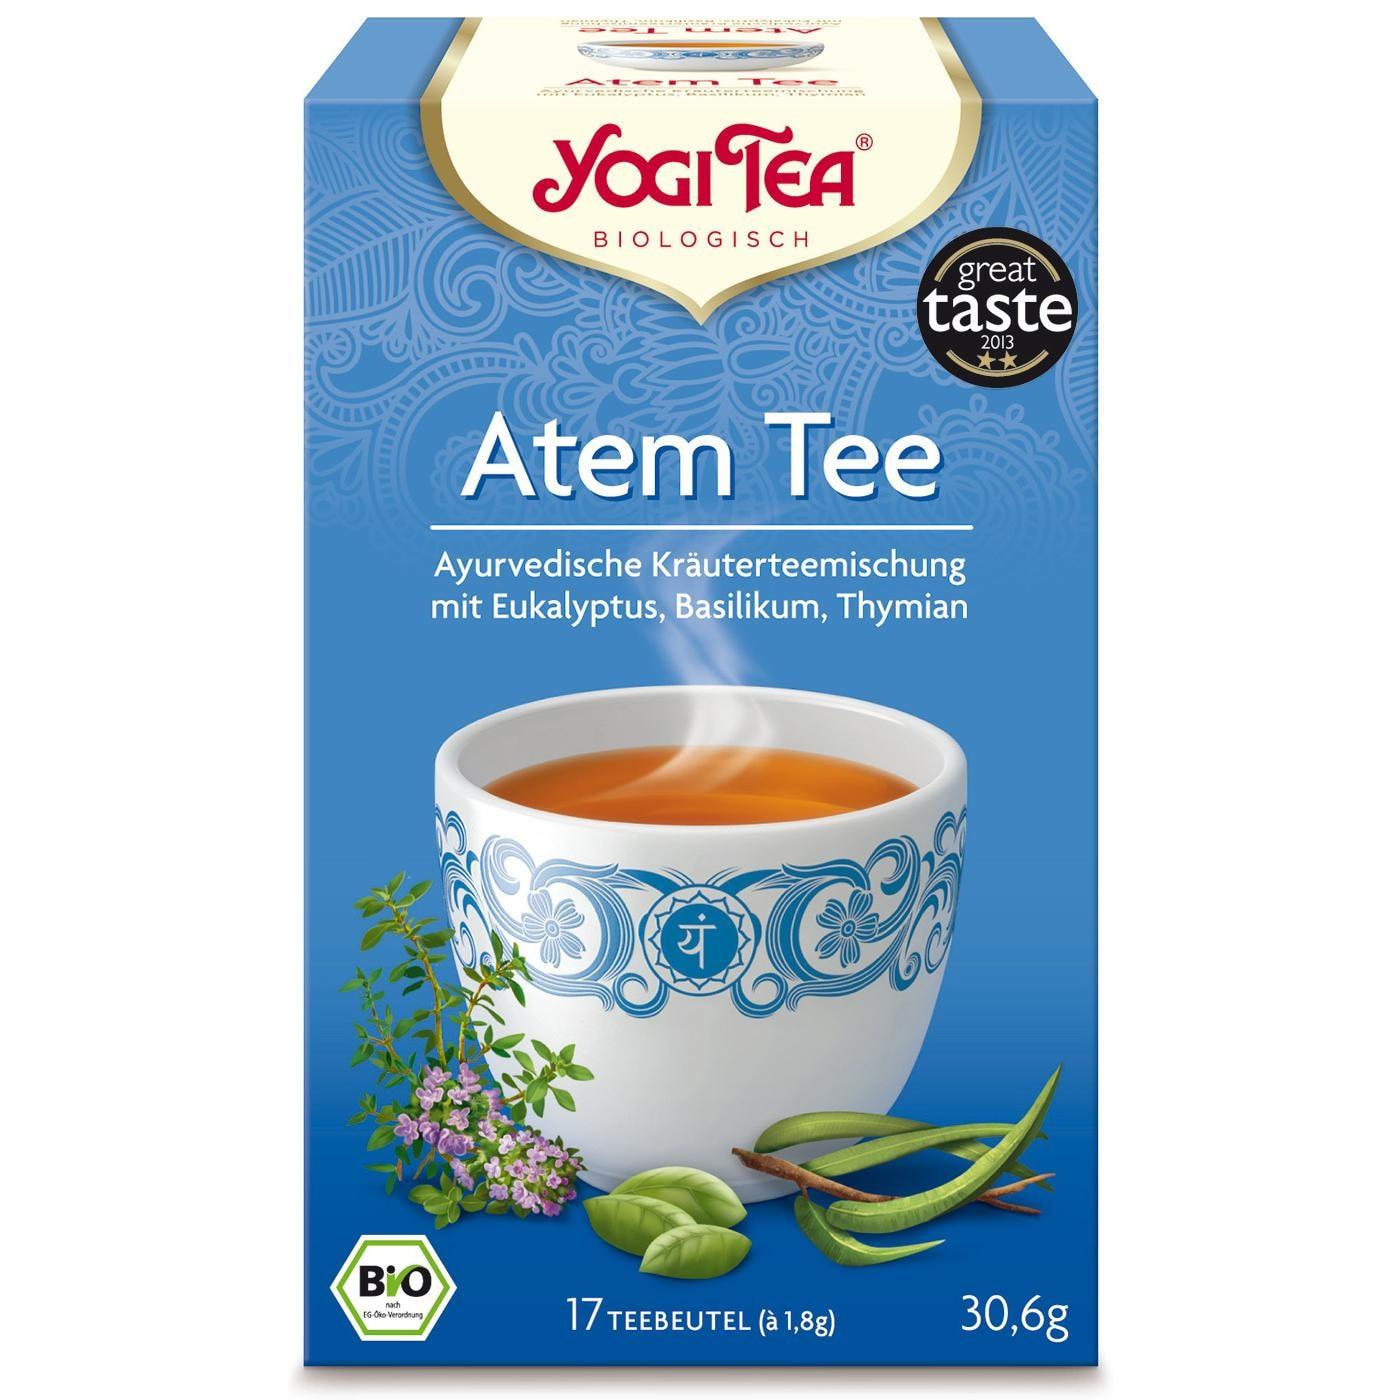 Yogi Tea Bio Atem Tee 30,6g